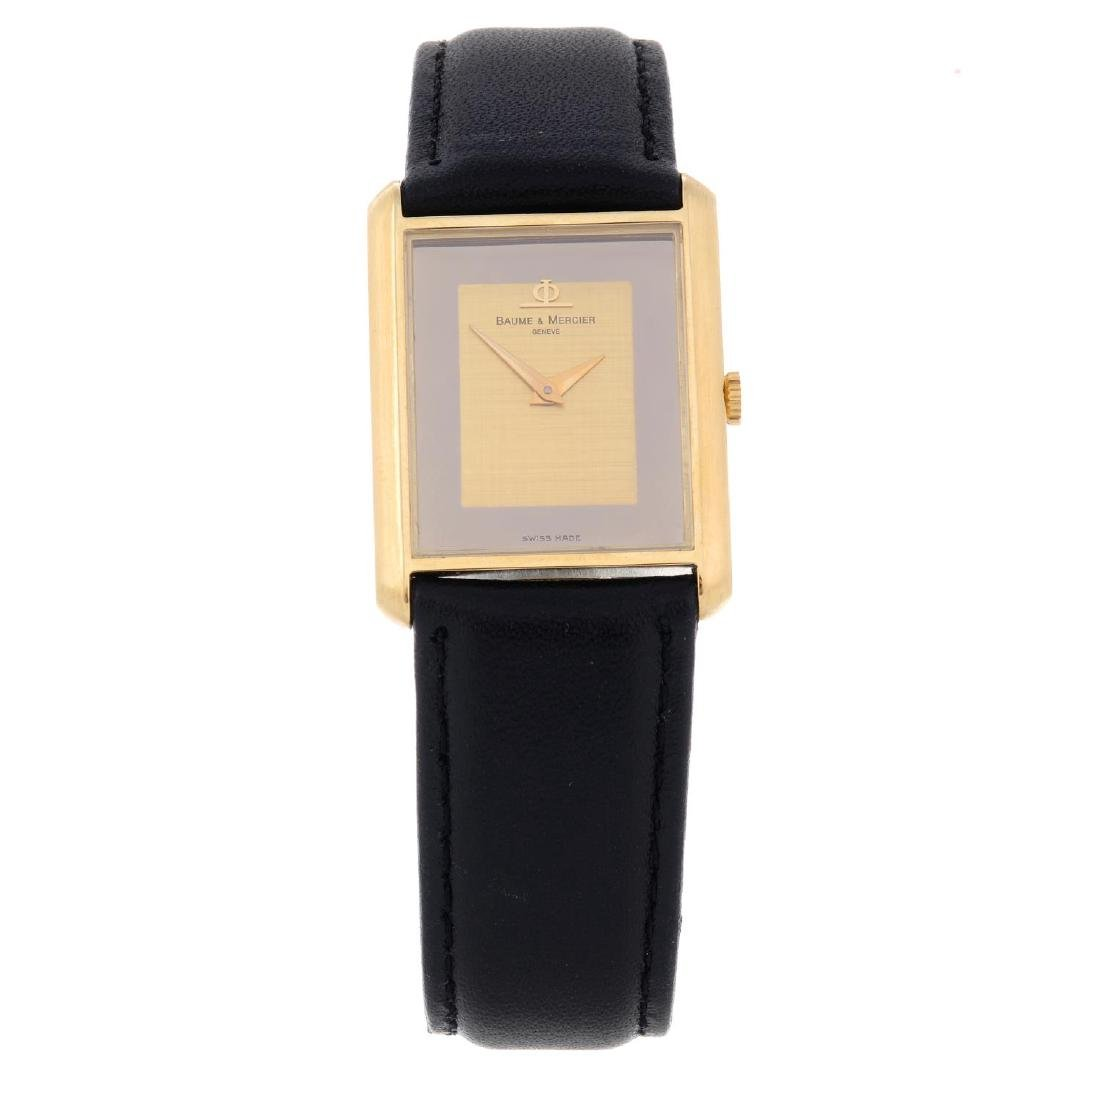 BAUME & MERCIER - a gentleman's wrist watch. Yellow